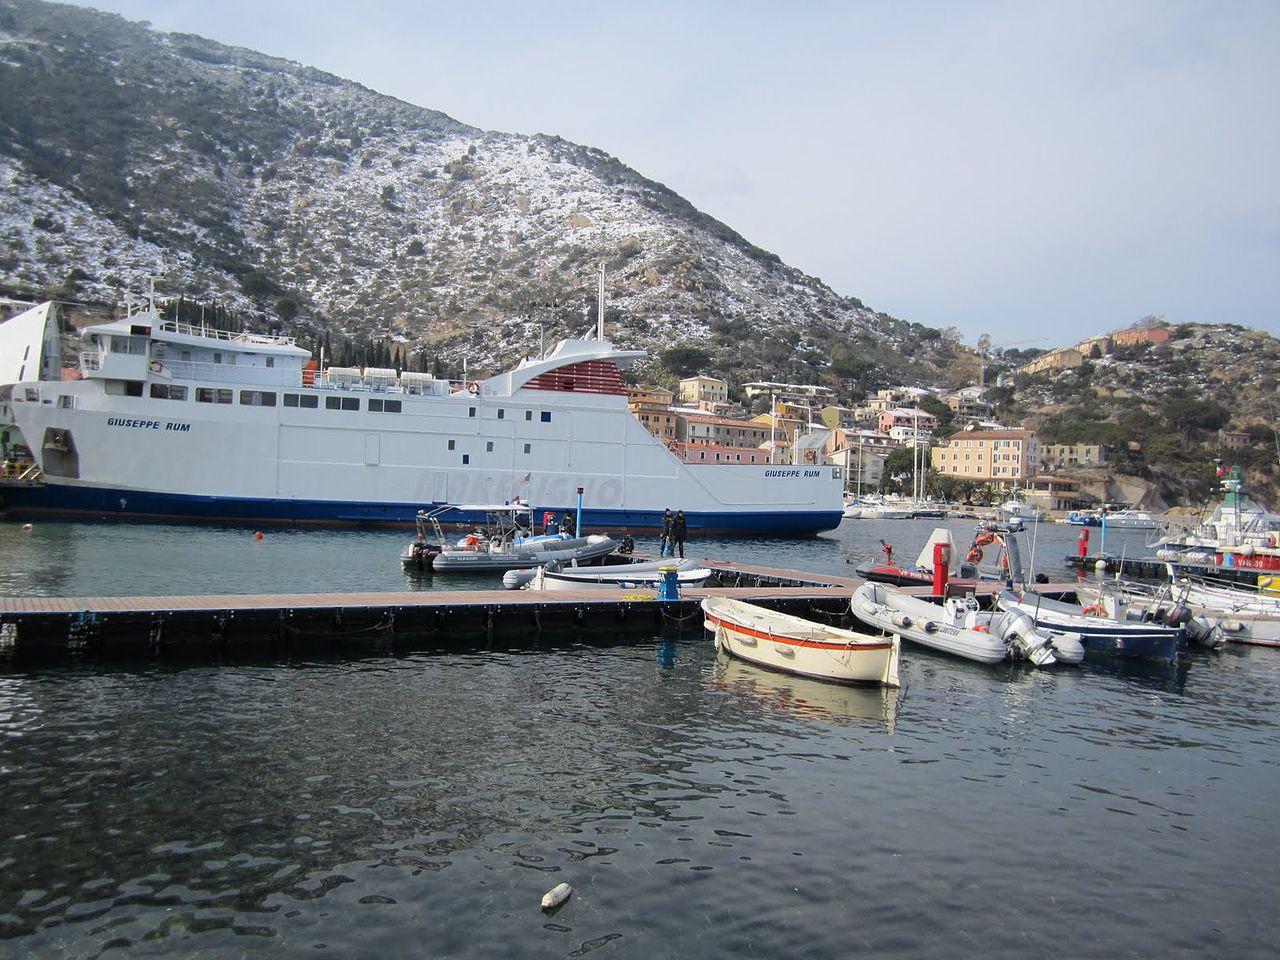 1280px-Ferry_Giuseppe_Rum_(IMO_9304954)_-_Port_of_Isola_del_Giglio_at_Giglio_Porto_-_Italy_-_12_Feb._2012